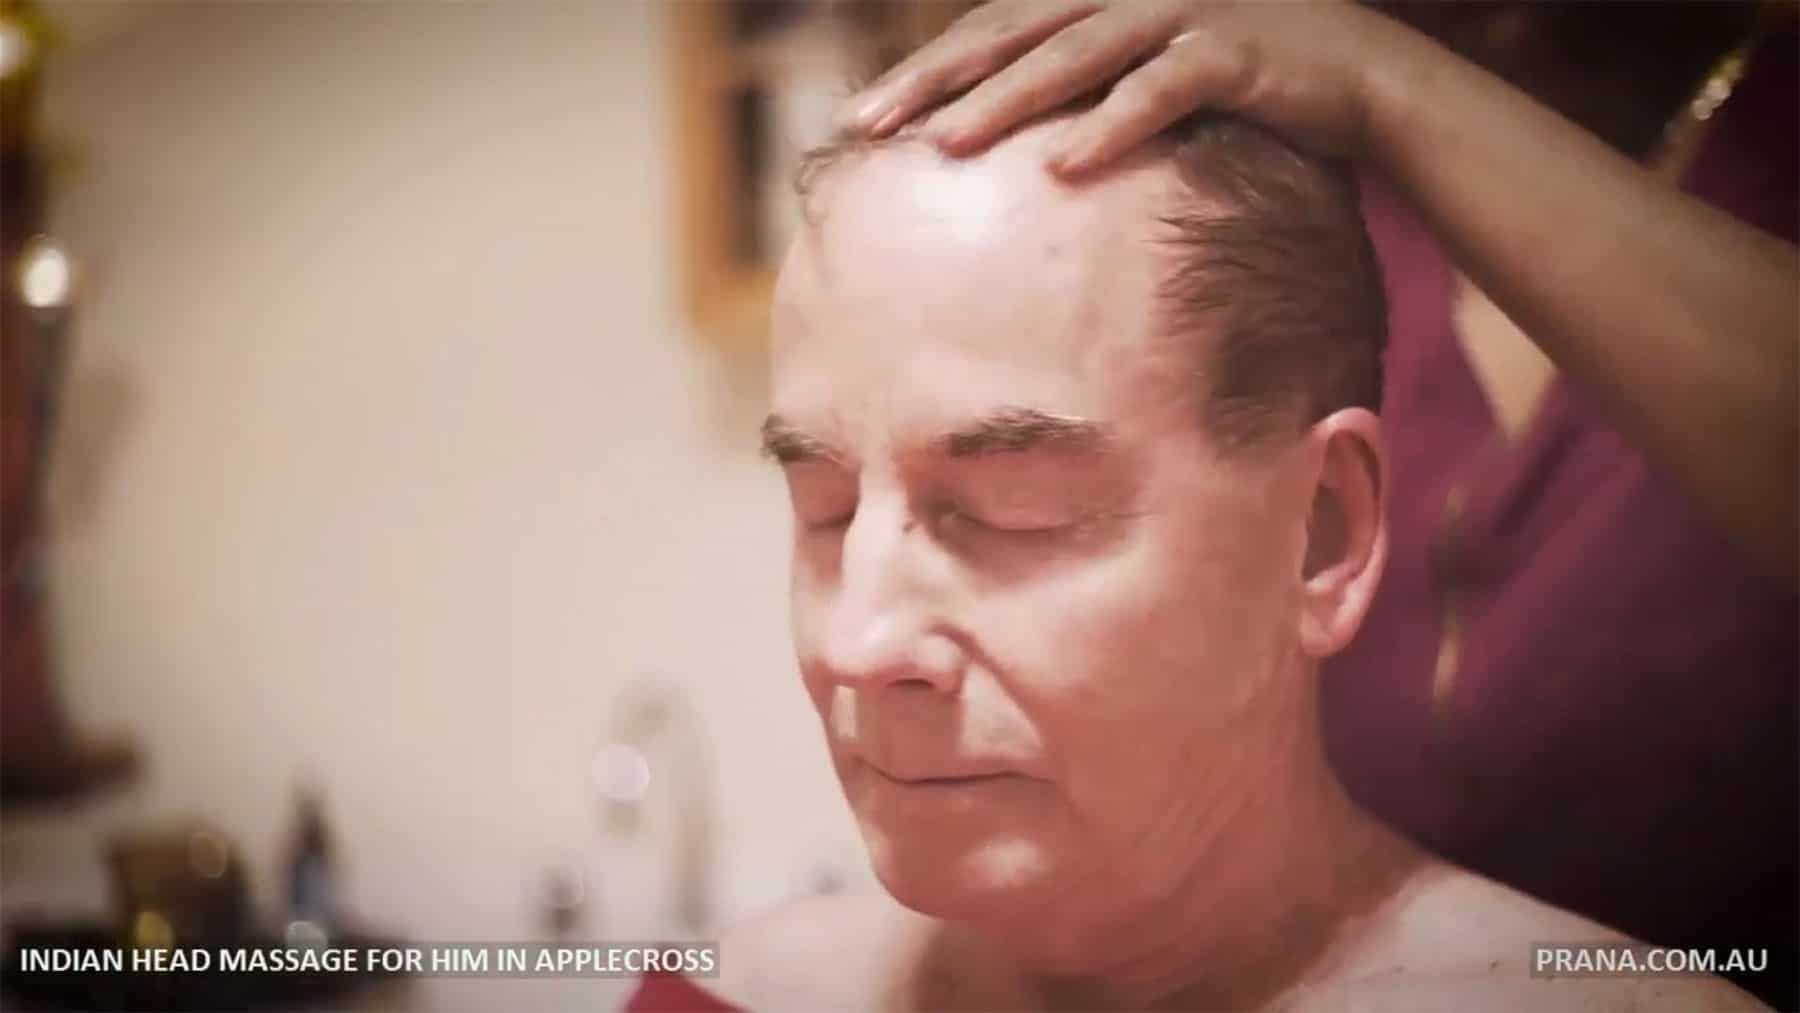 Indian Head Massage for Men